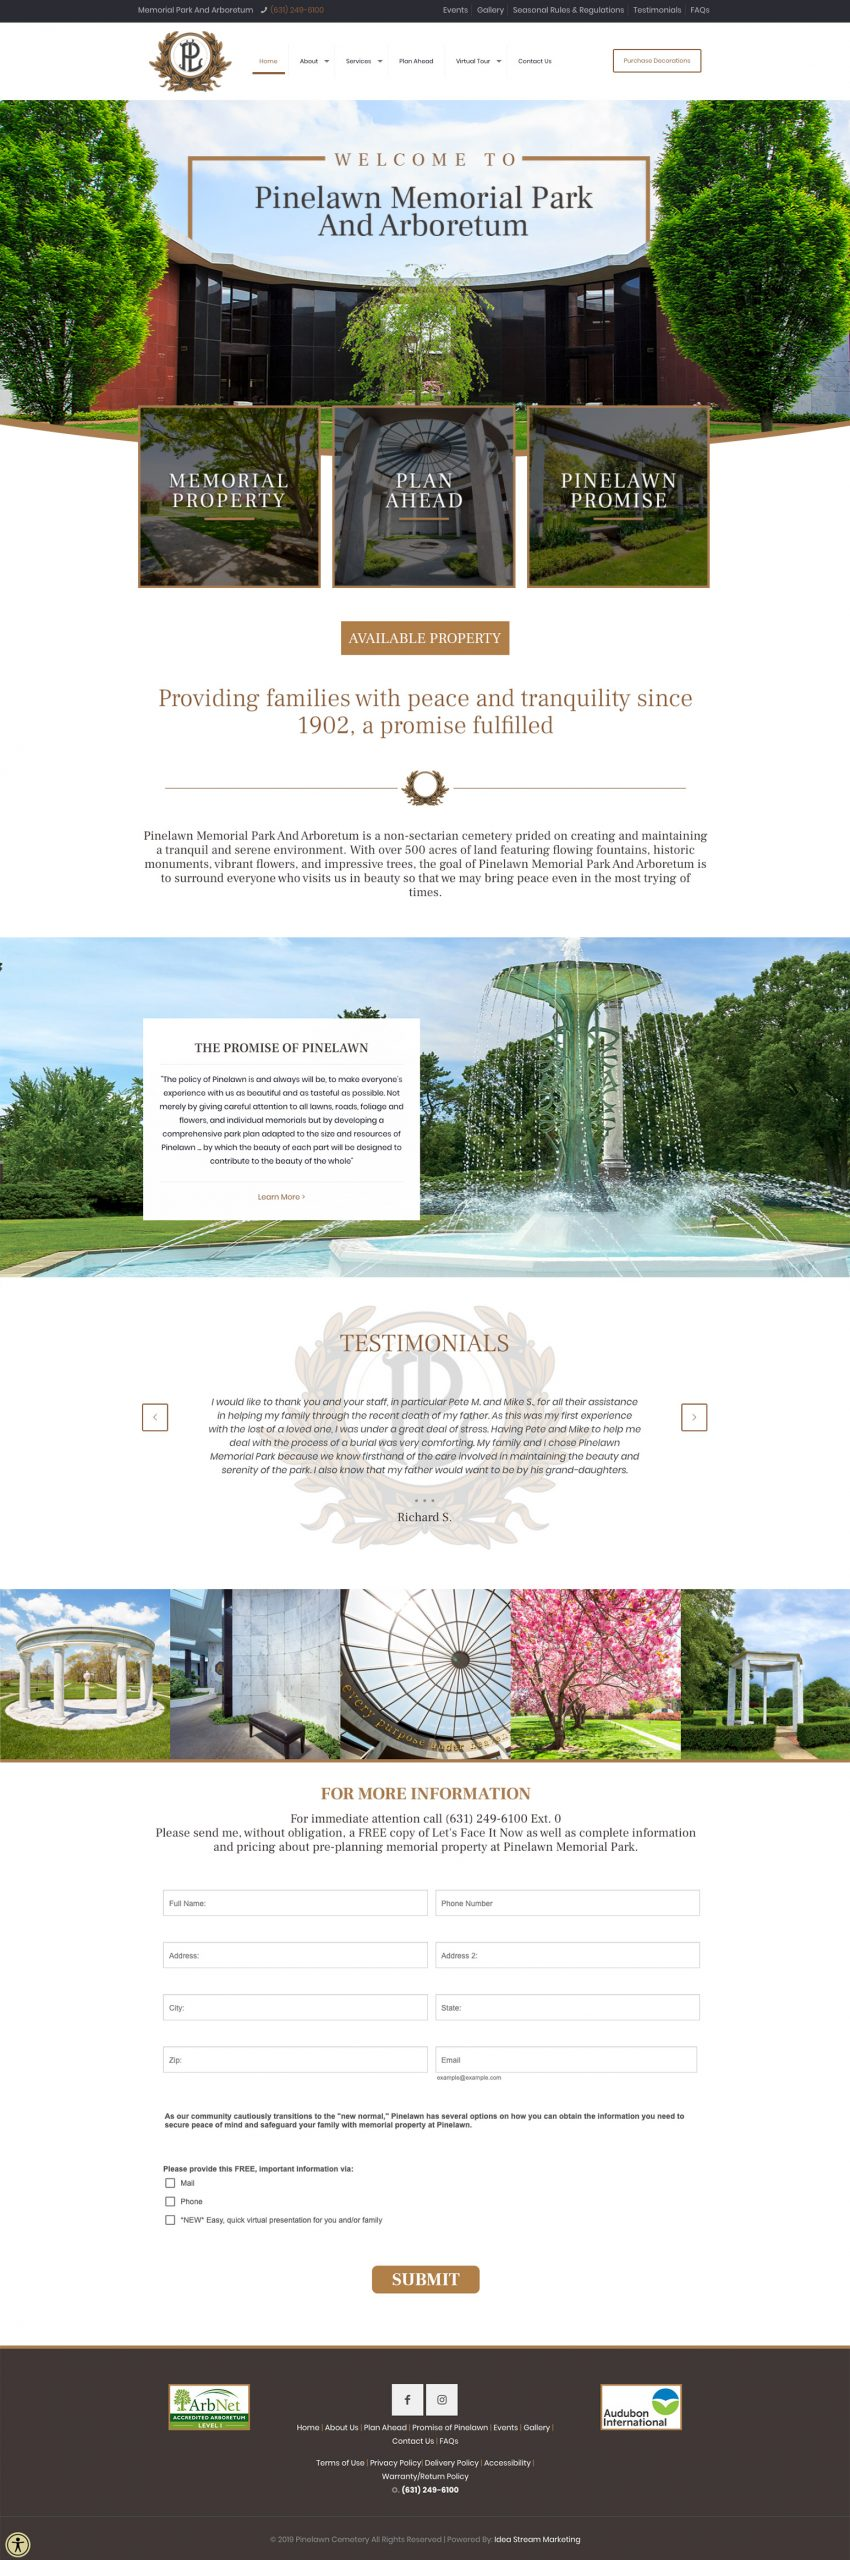 Pinelawn Memorial Park And Arboretum